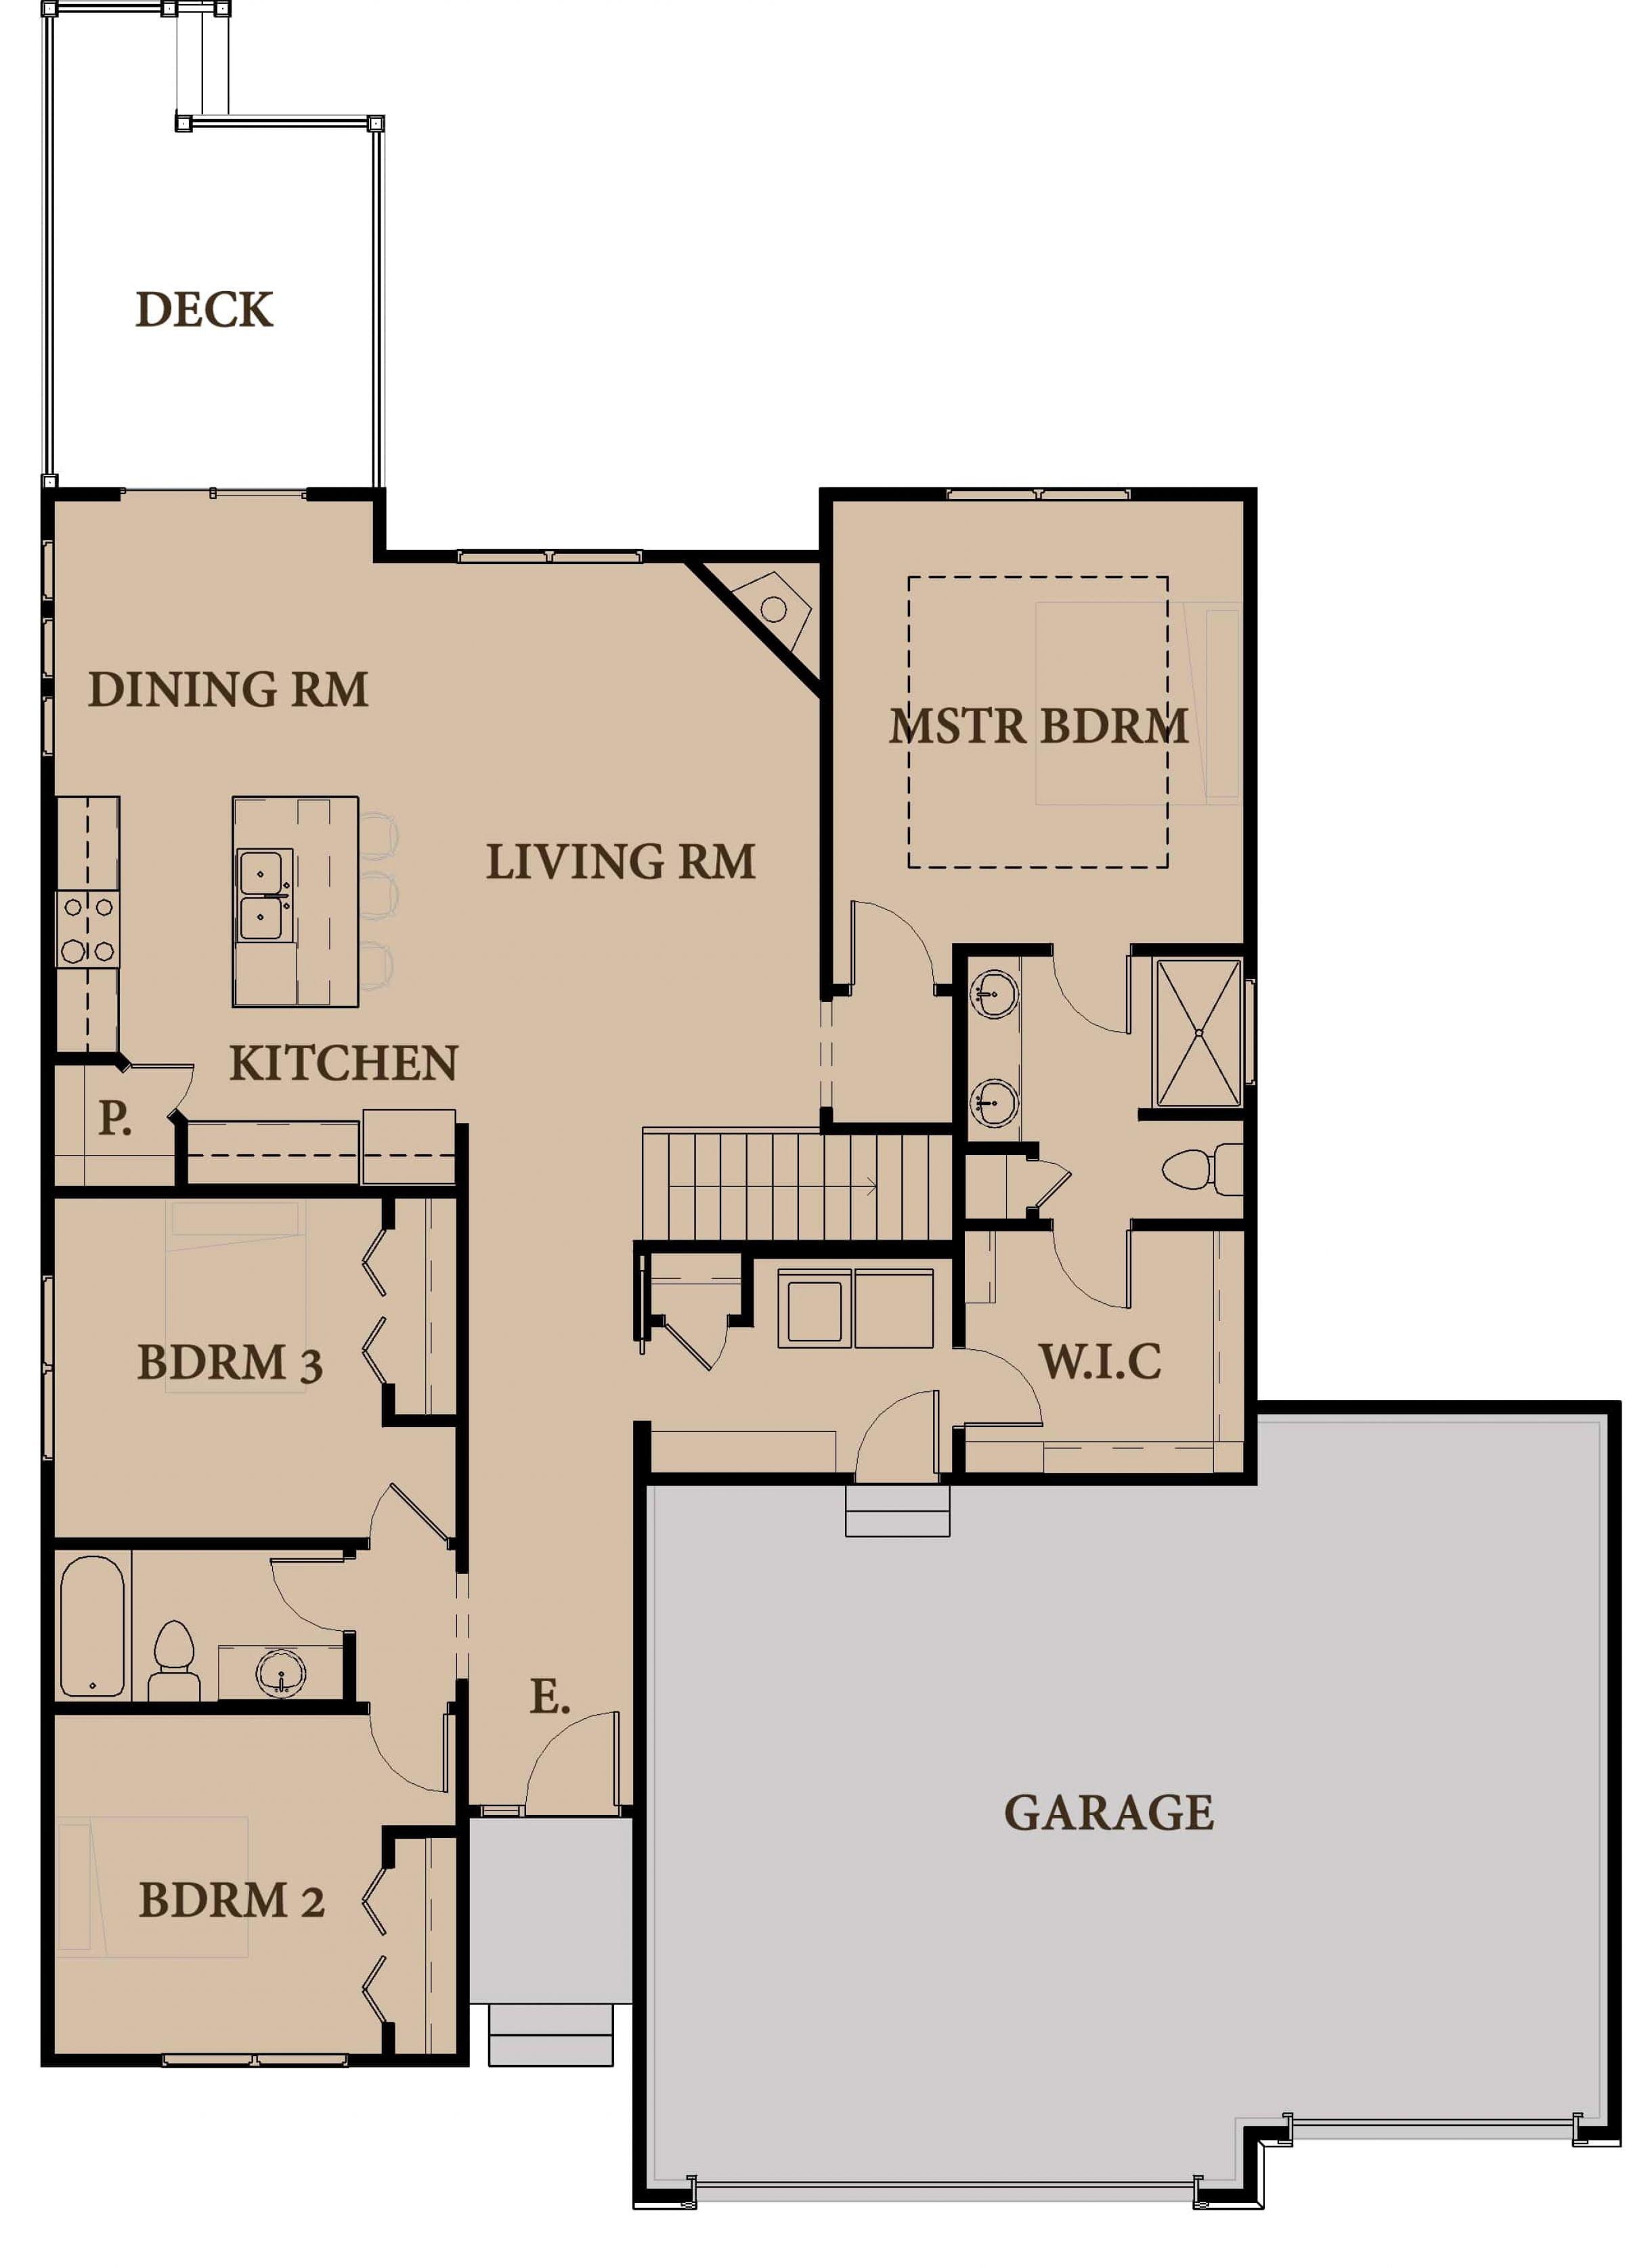 residential-warren-county-iowa-1-acres-listing-number-14995-1-2020-05-15-014740.jpg